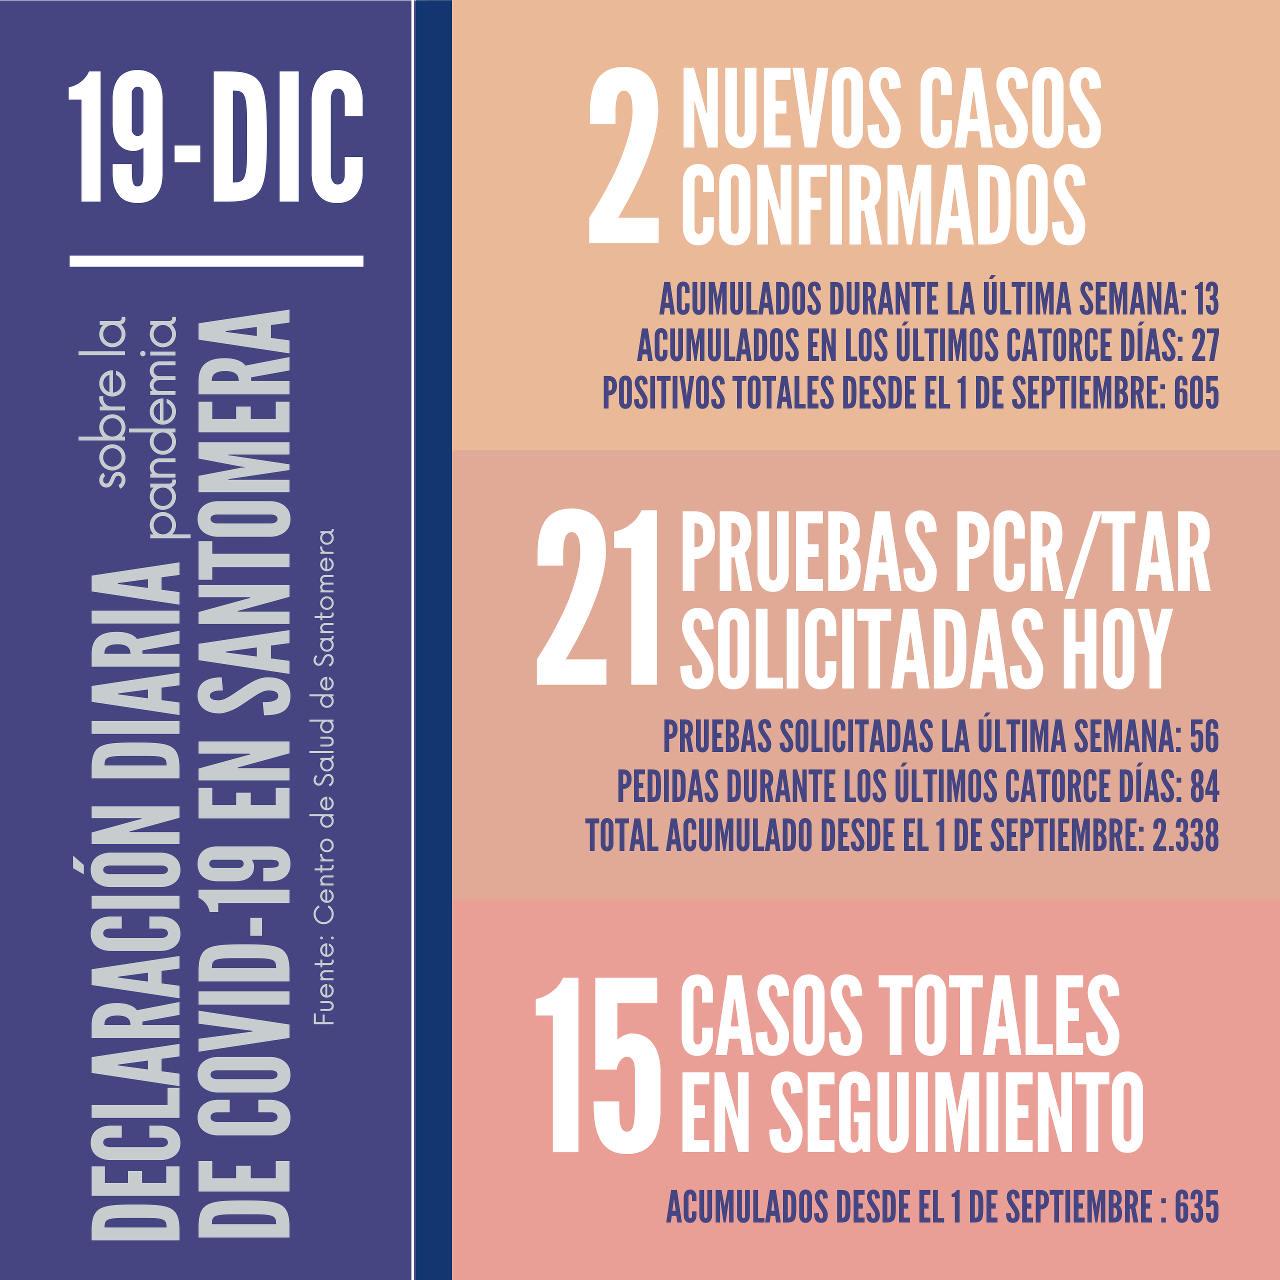 20201219_Datos COVID-19 Santomera